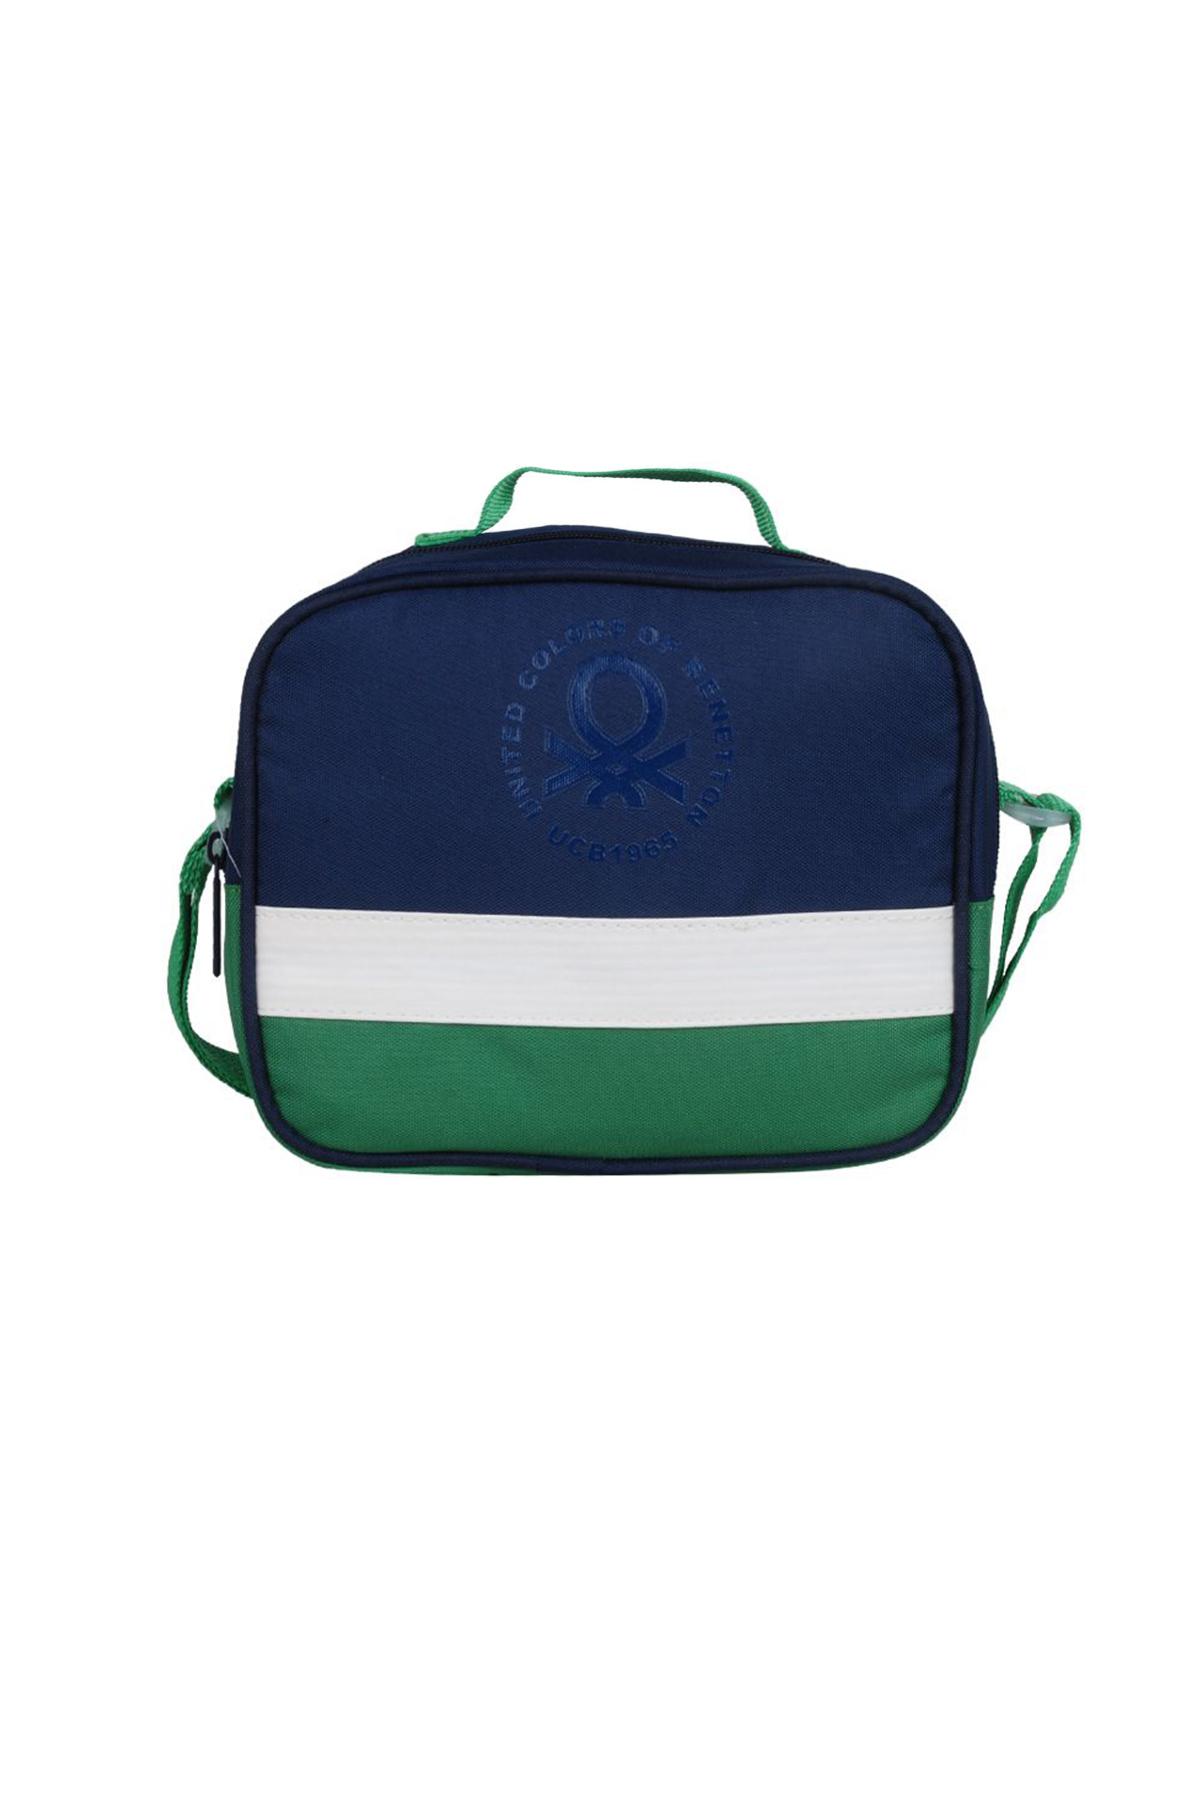 Benetton Lunch Box